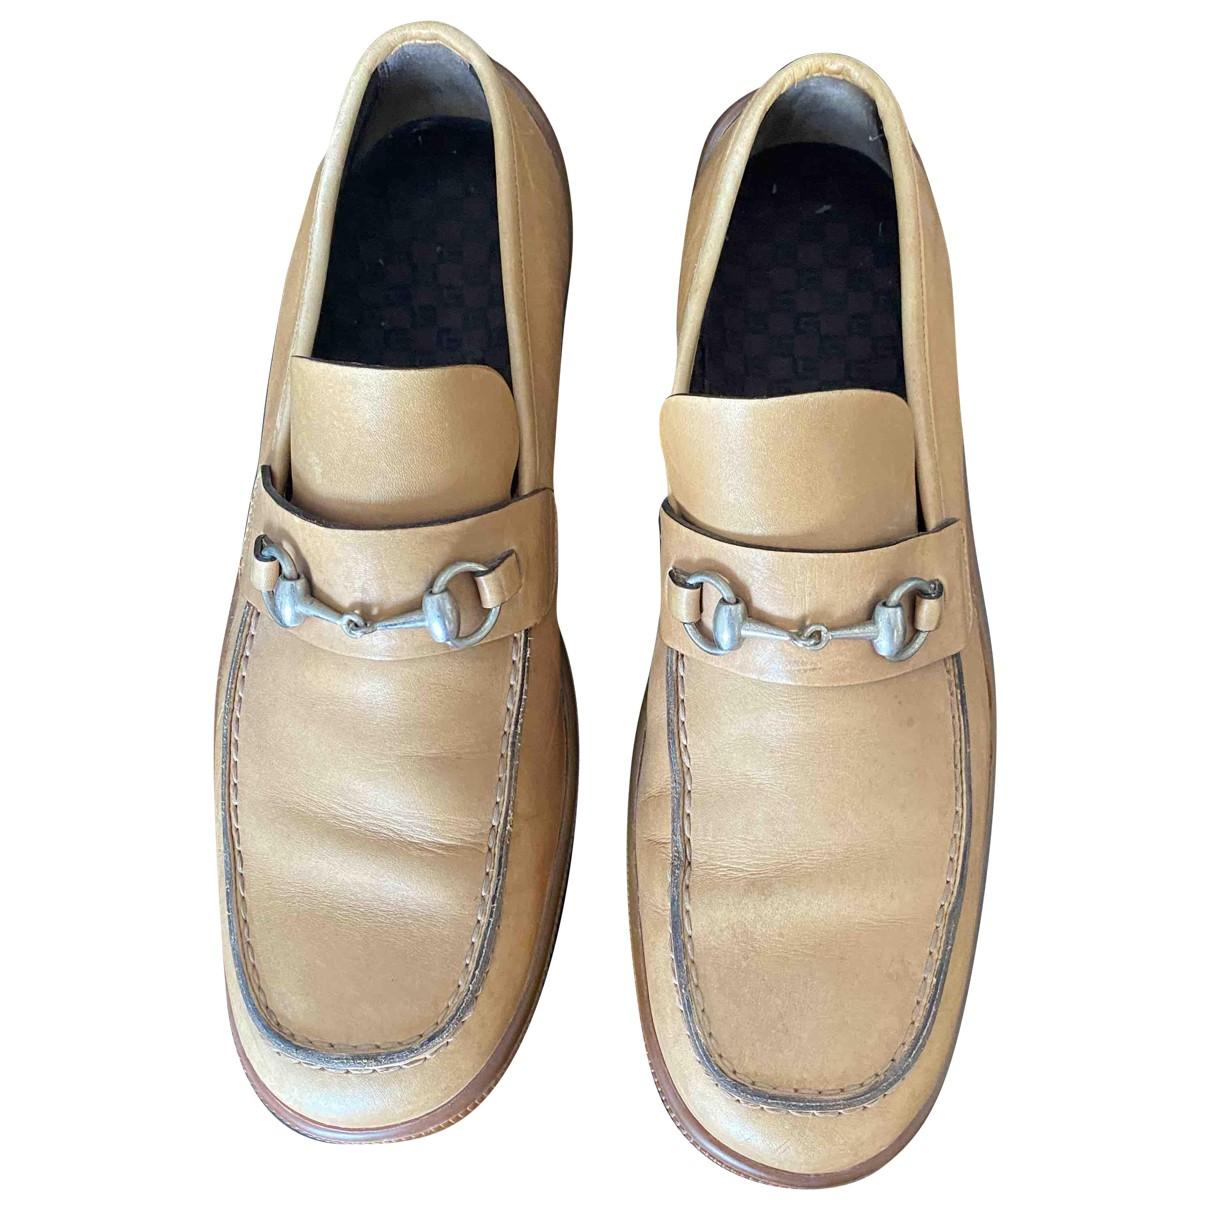 Gucci \N Mokassins in  Beige Leder